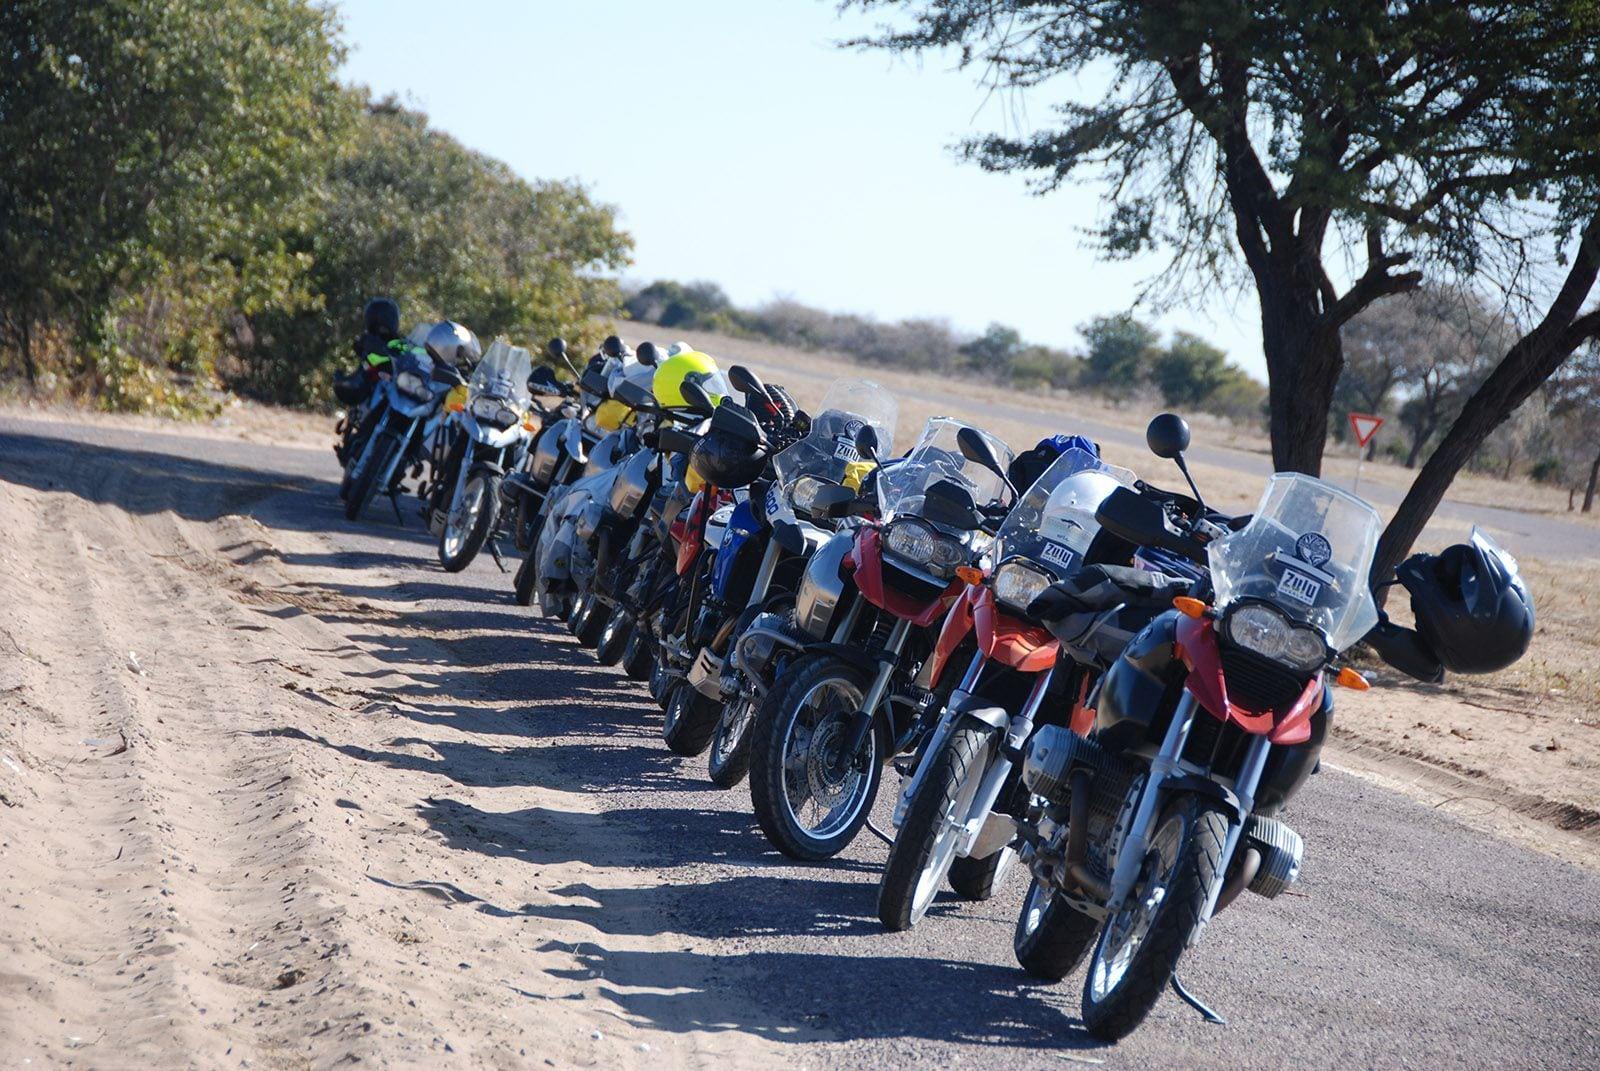 230 kms tarmac. Accommodation near Ghanzi.